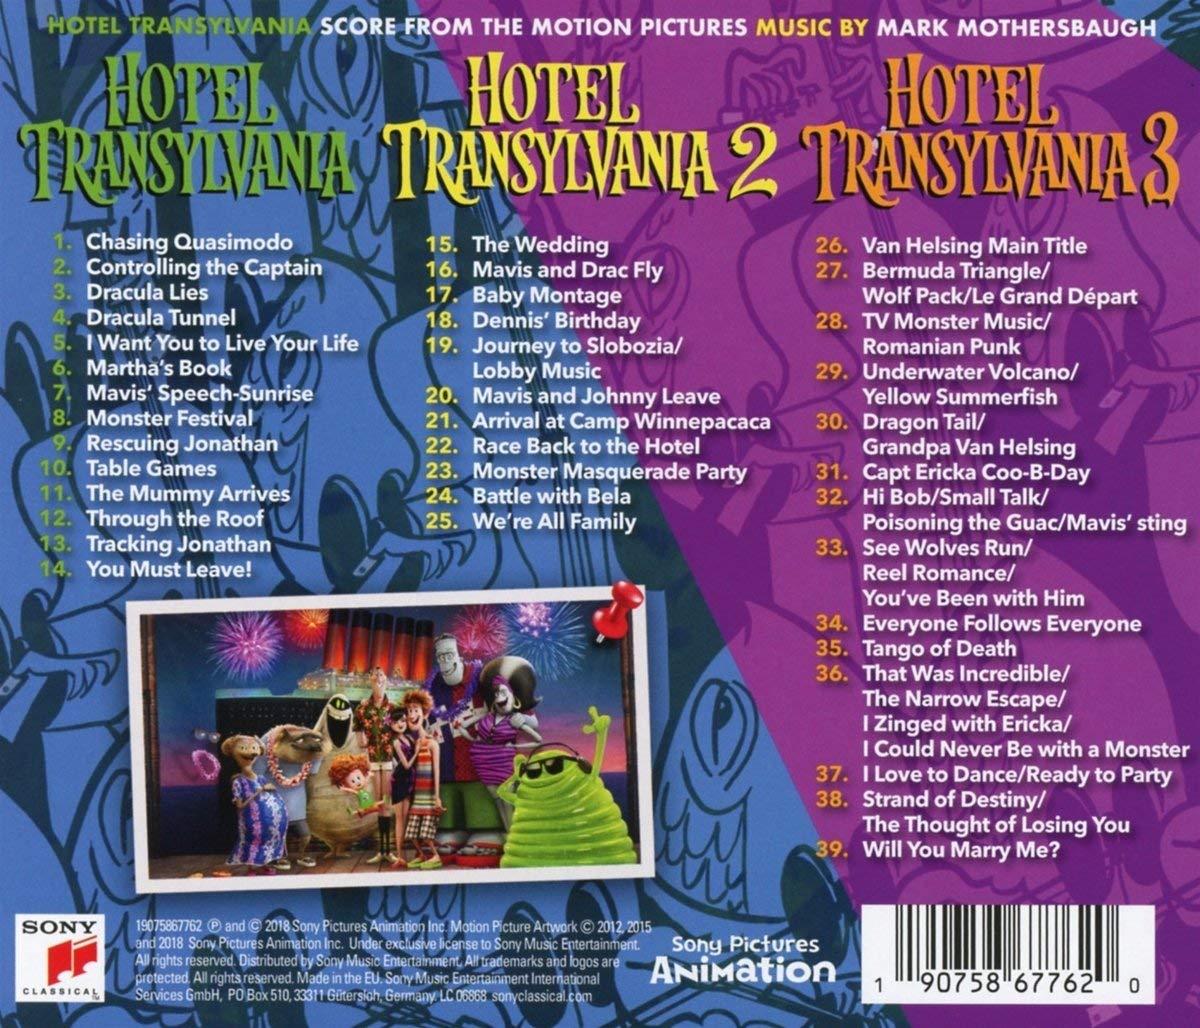 Hotel transylvania 3 original motion soundtrack music musica It's Party Time Sony Classic Mark Mothersbaugh